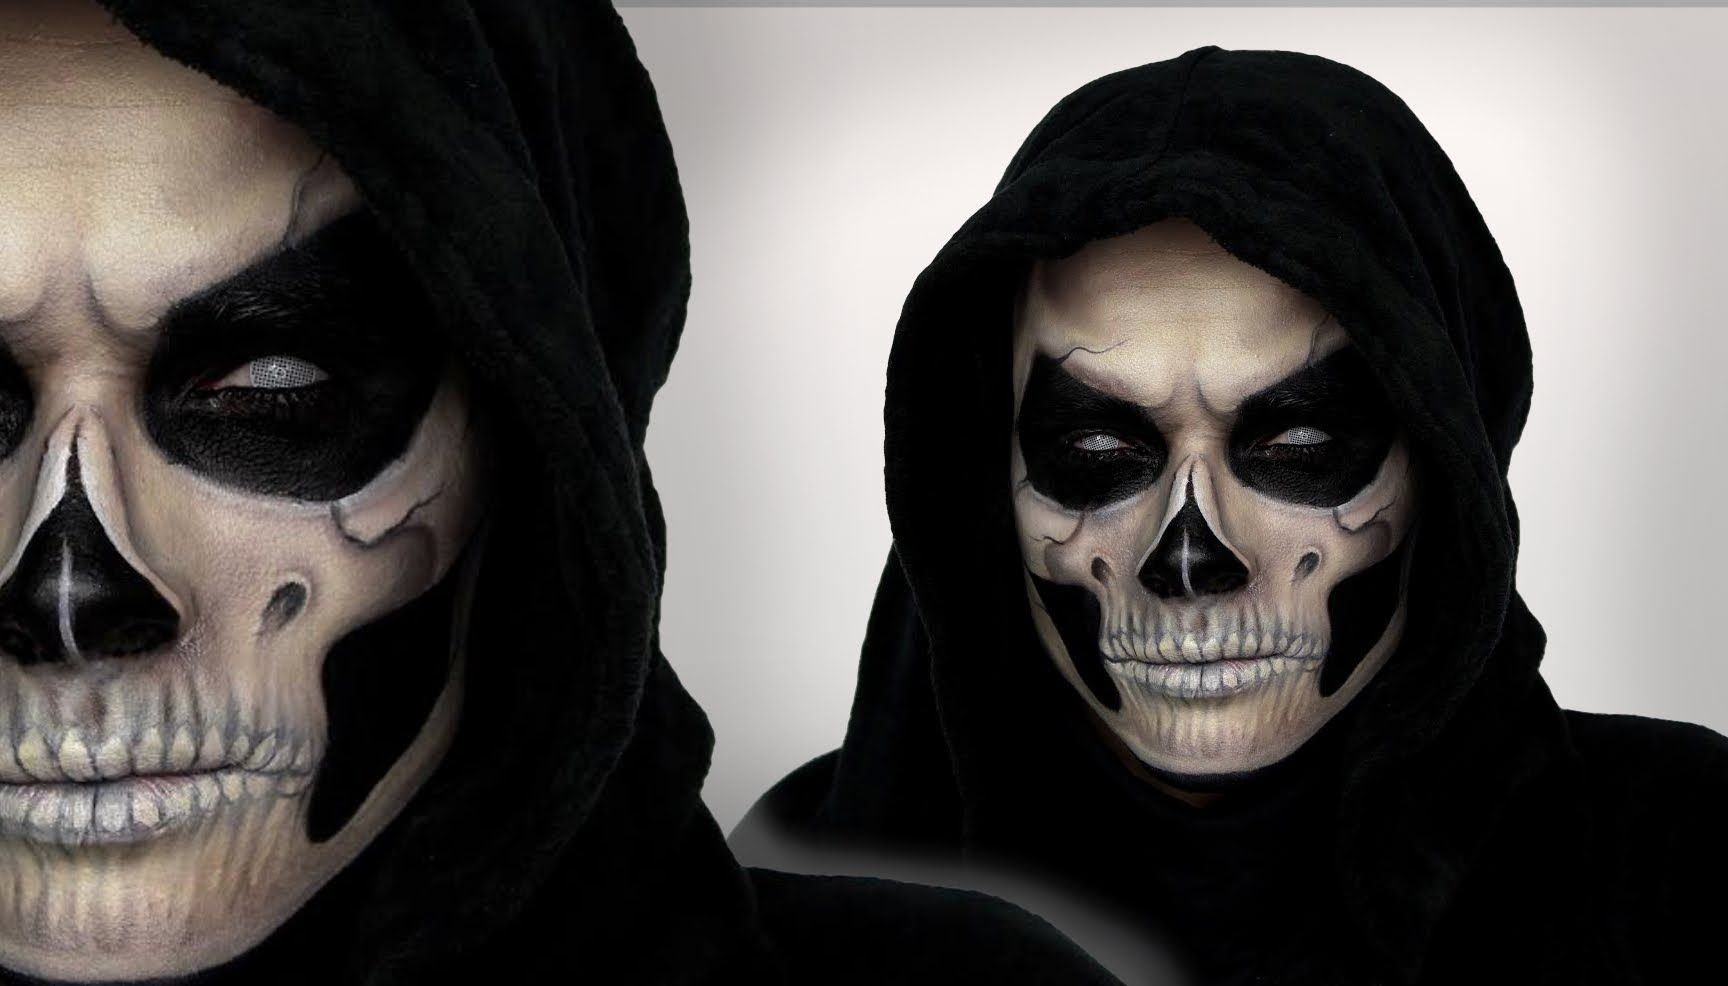 Face Paint & Stage Make-Up Halloween Make Up Set Grim Reaper